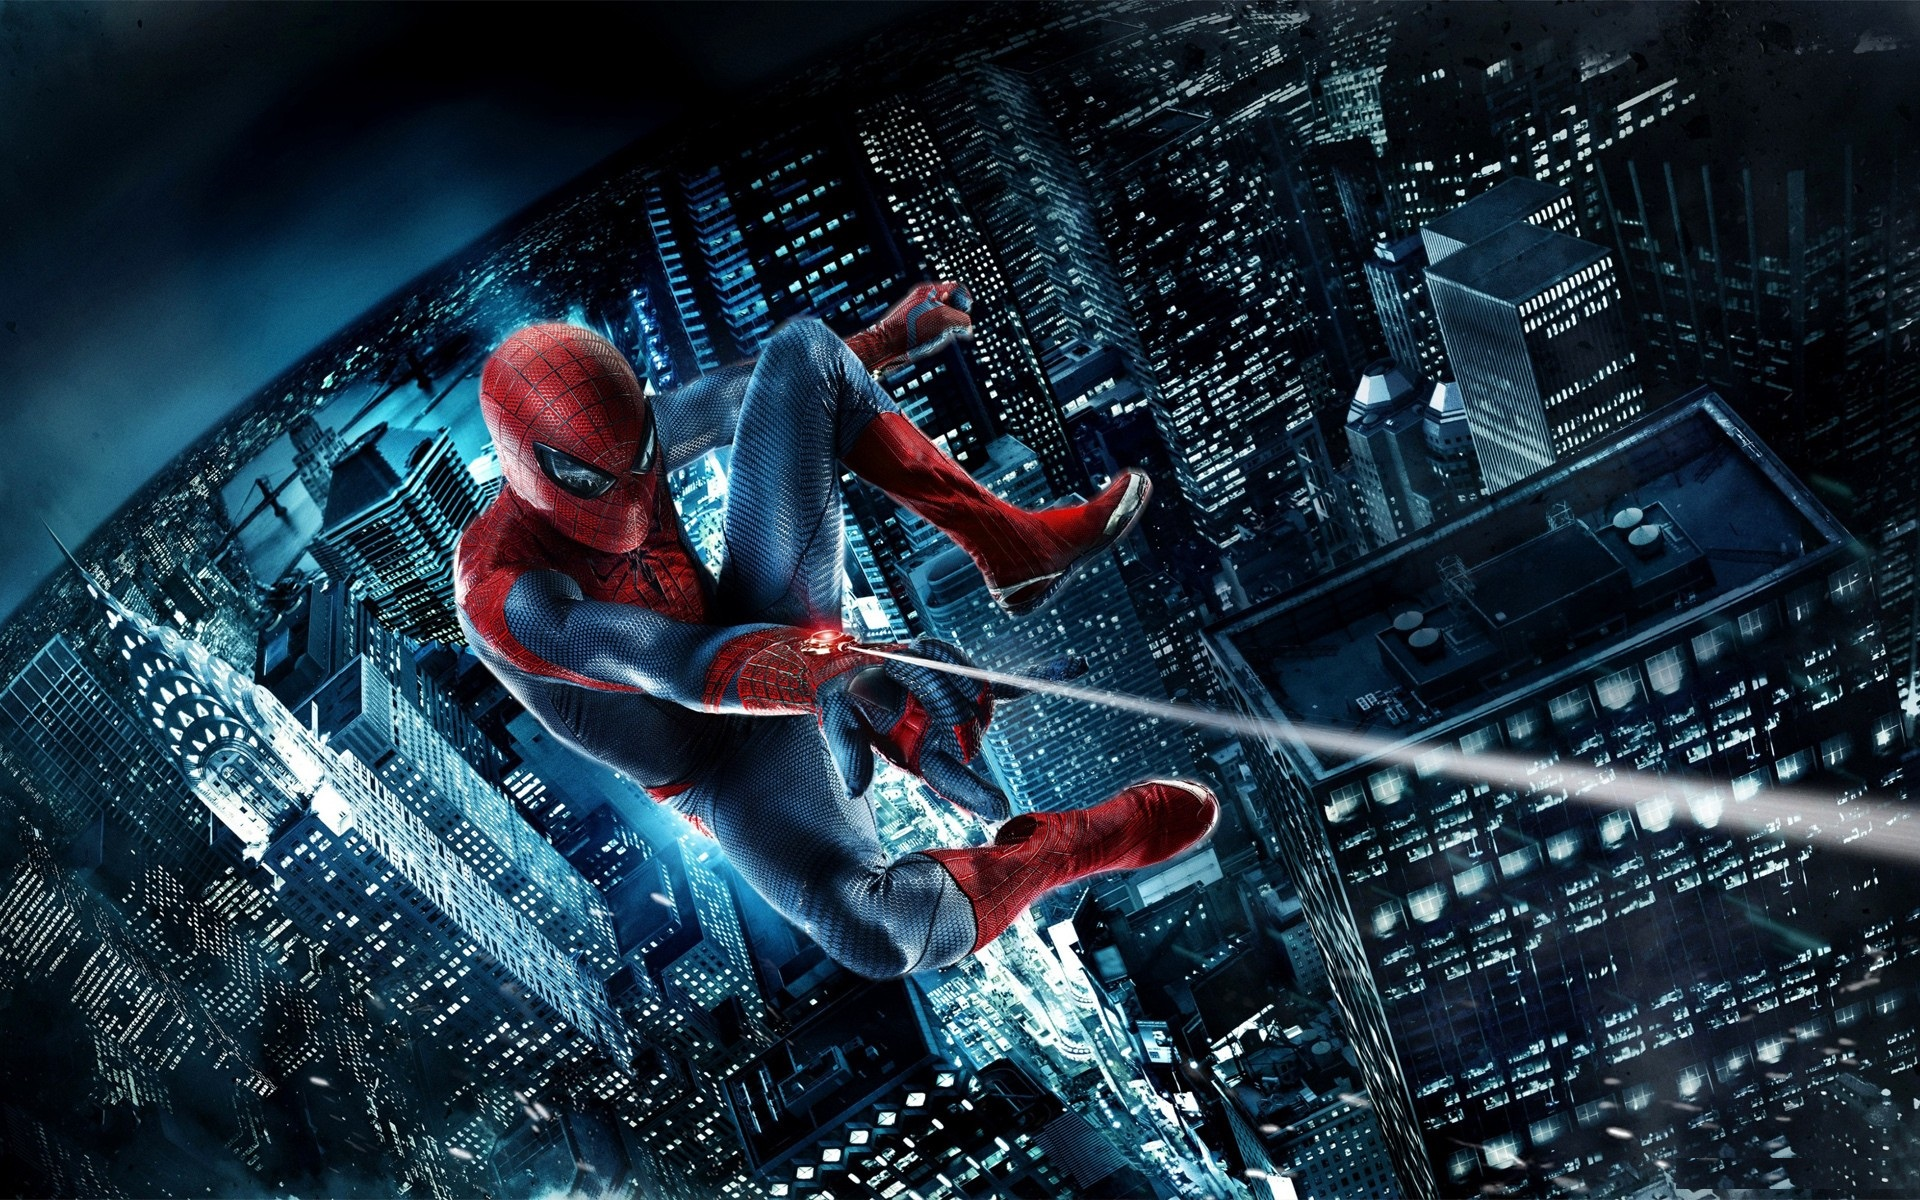 SpiderMan Shattered Dimensions HD Desktop Wallpaper Widescreen 1920x1200